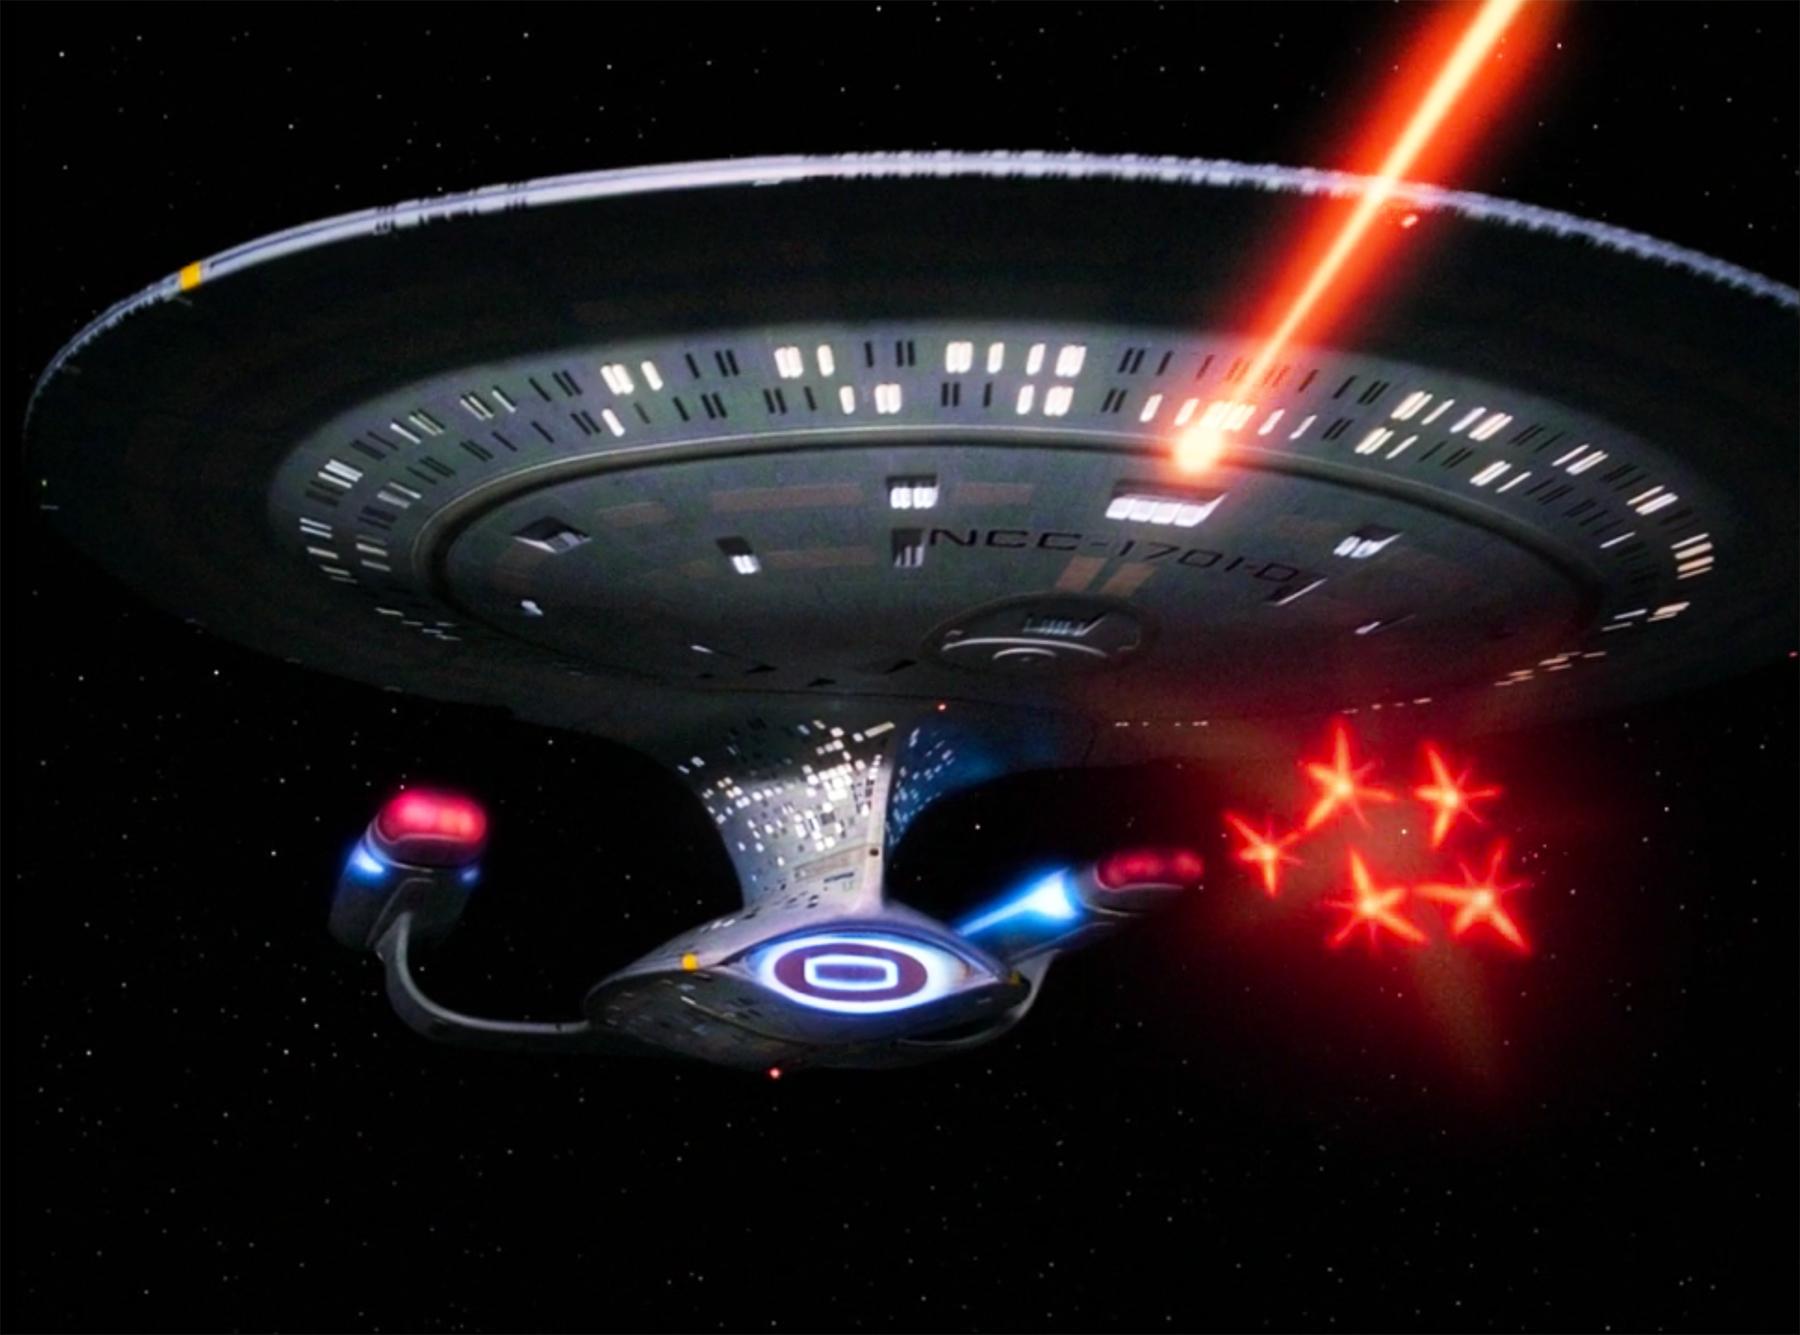 Uss enterprise ncc 1701 d galaxy class saucer separation r flickr - Enterprise D Fires Phasers And A Simultaneous Volley Of Torpedoes Star Trek Pinterest Star Trek Trek And Fandom